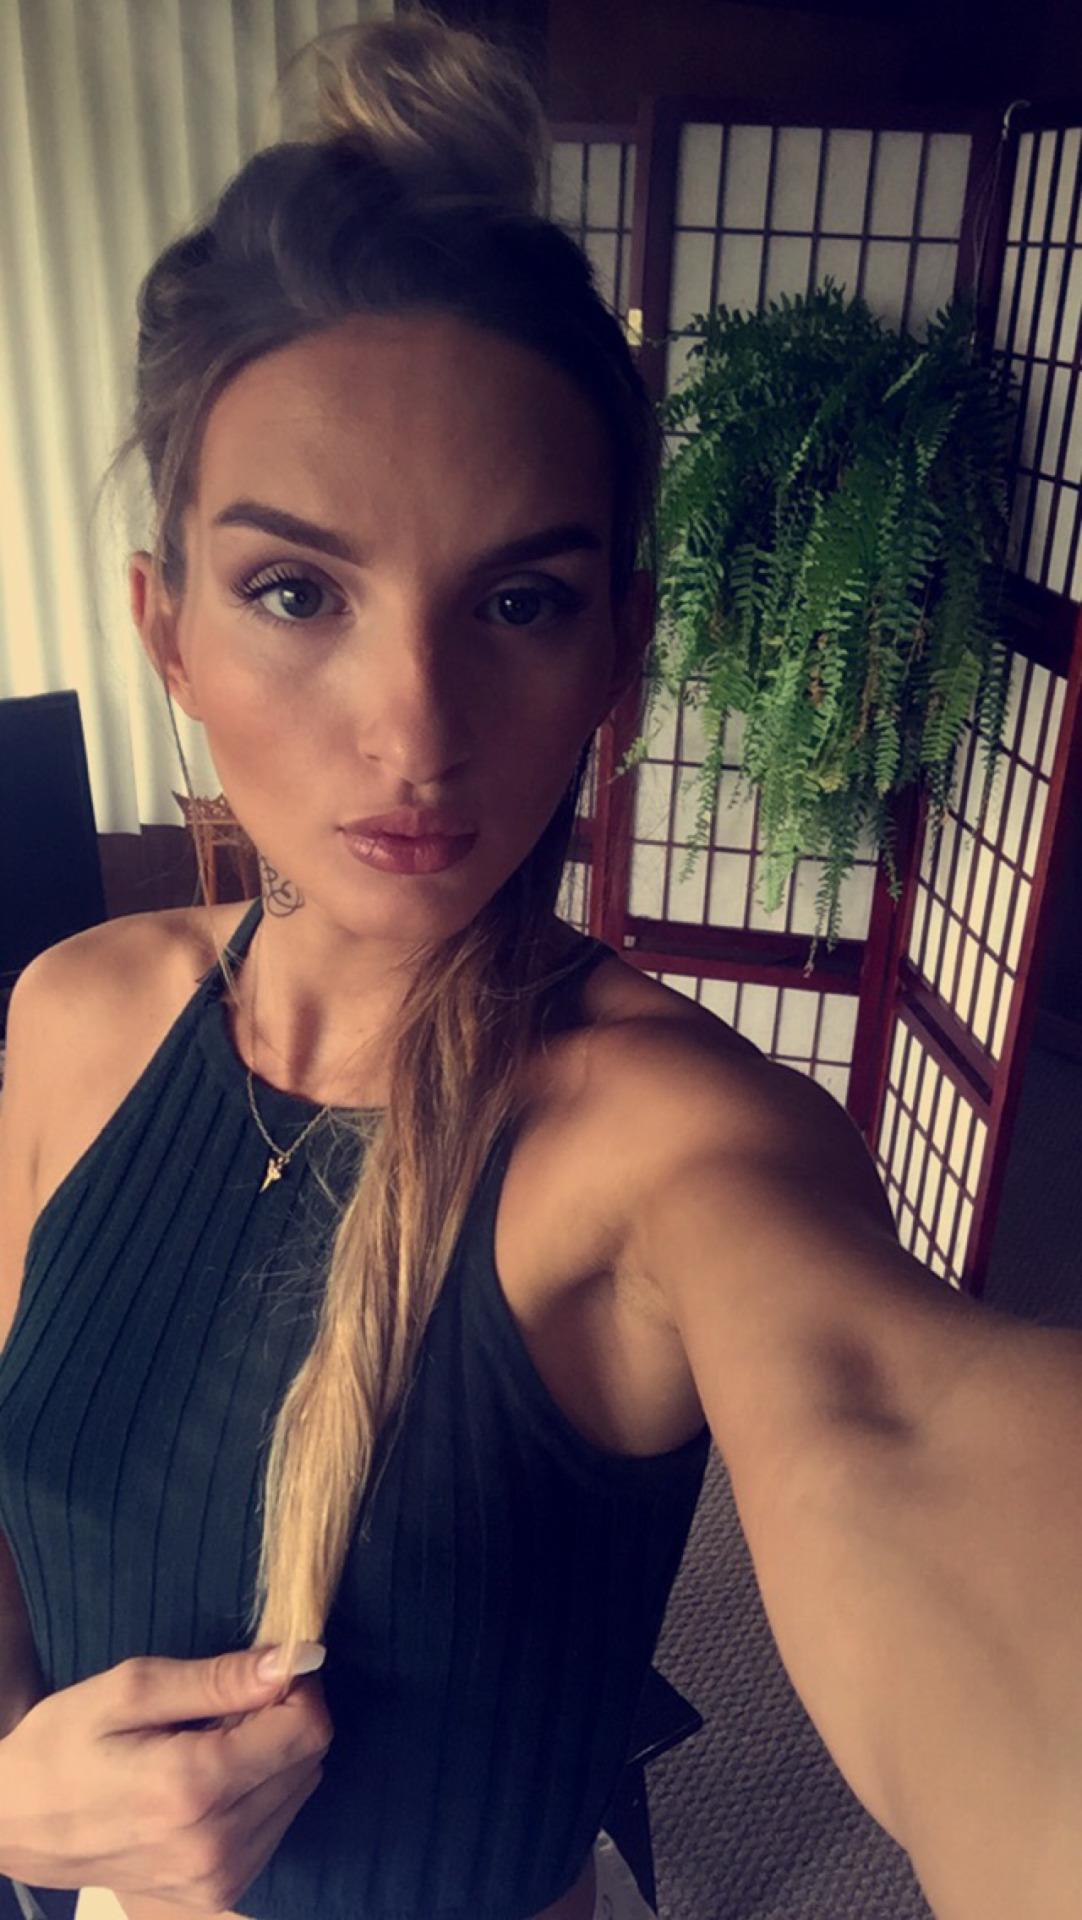 selfie sexy de fille du 56